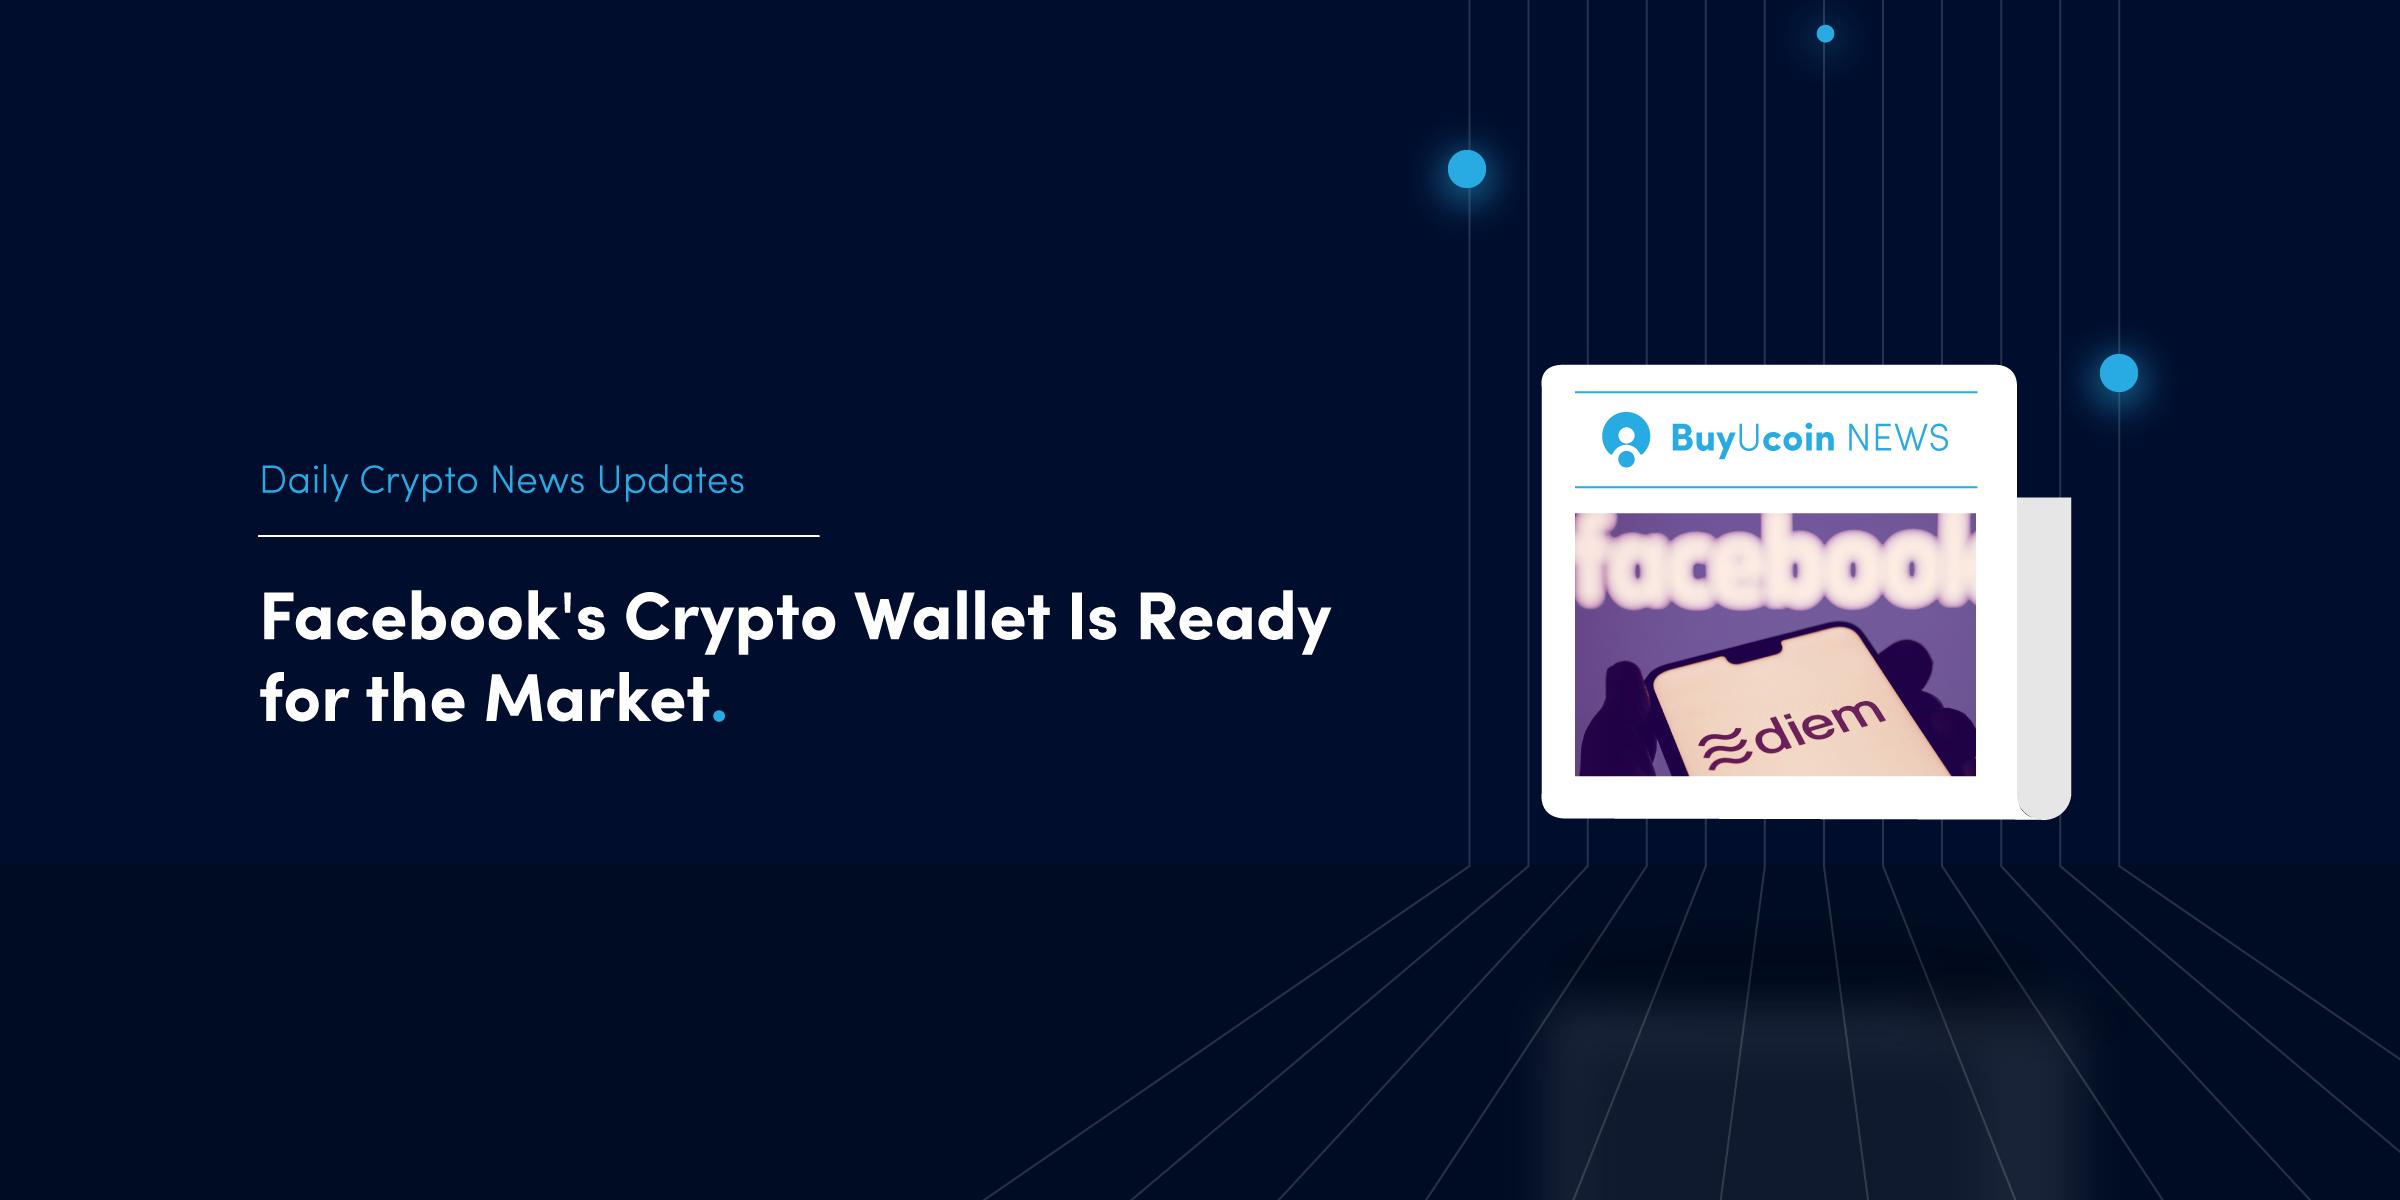 Facebook's Crypto Wallet